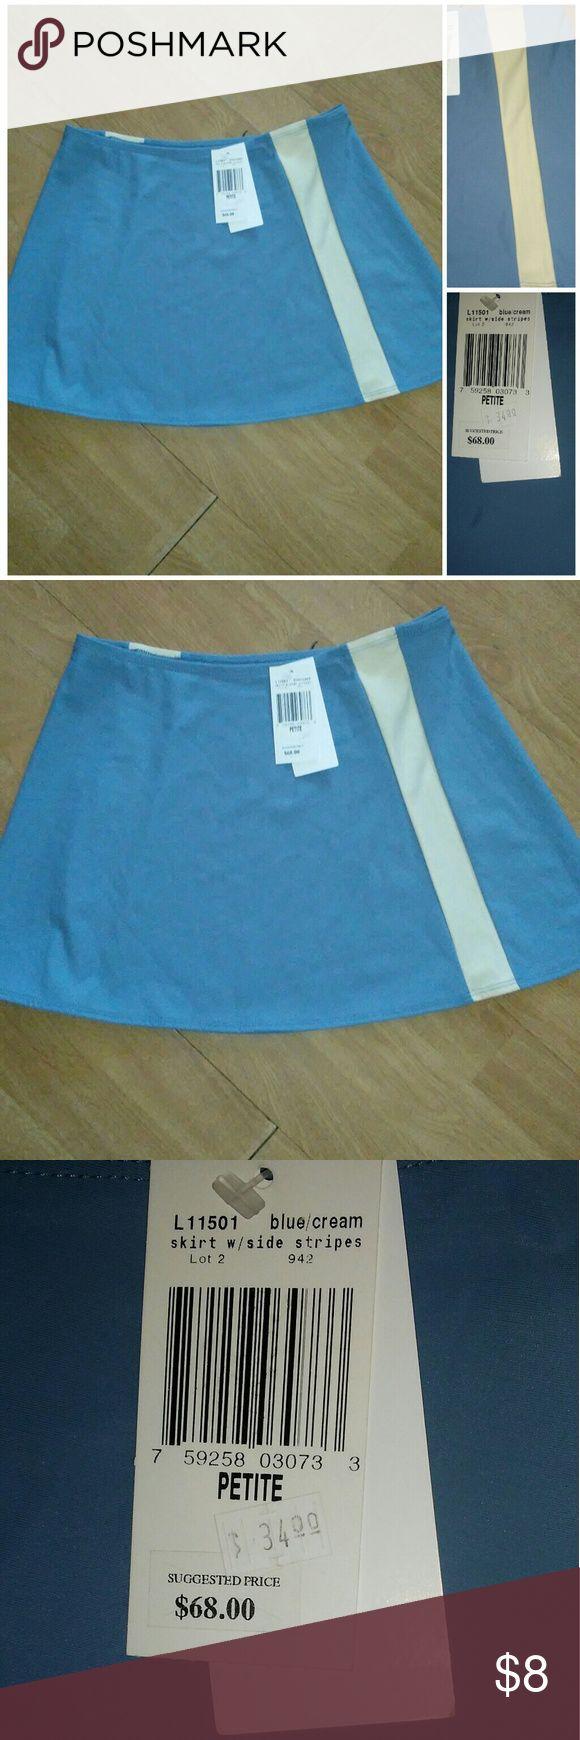 💙Aqua💙Swim Skirt with Stripe-Sz Petite (XS) Cute and modest swim skirt. Dusty blue with creme stripes on either side. Stretch waist  Can be worn to cover bikini bottom.  Size Petite.  Petite usually fits like an XS Aqua Swim